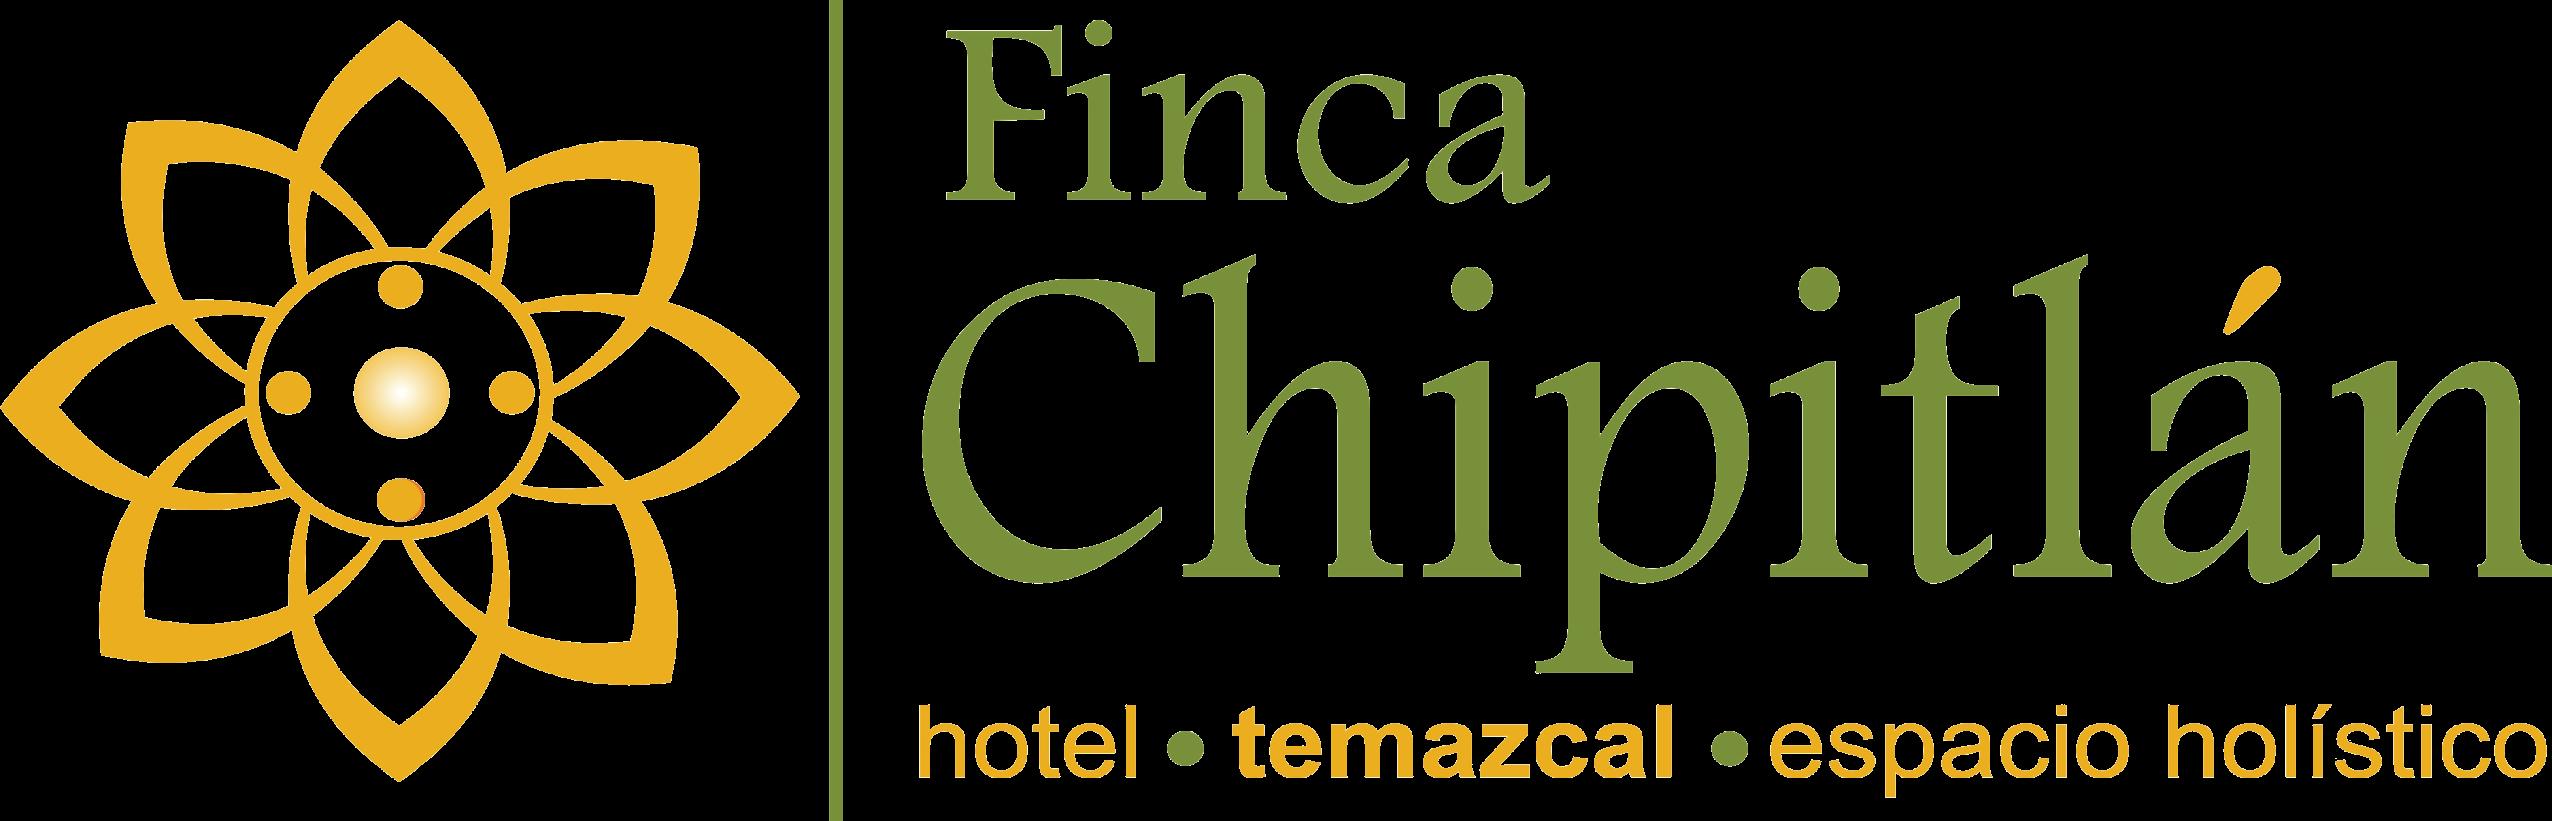 Finca Chipitlan Hotel